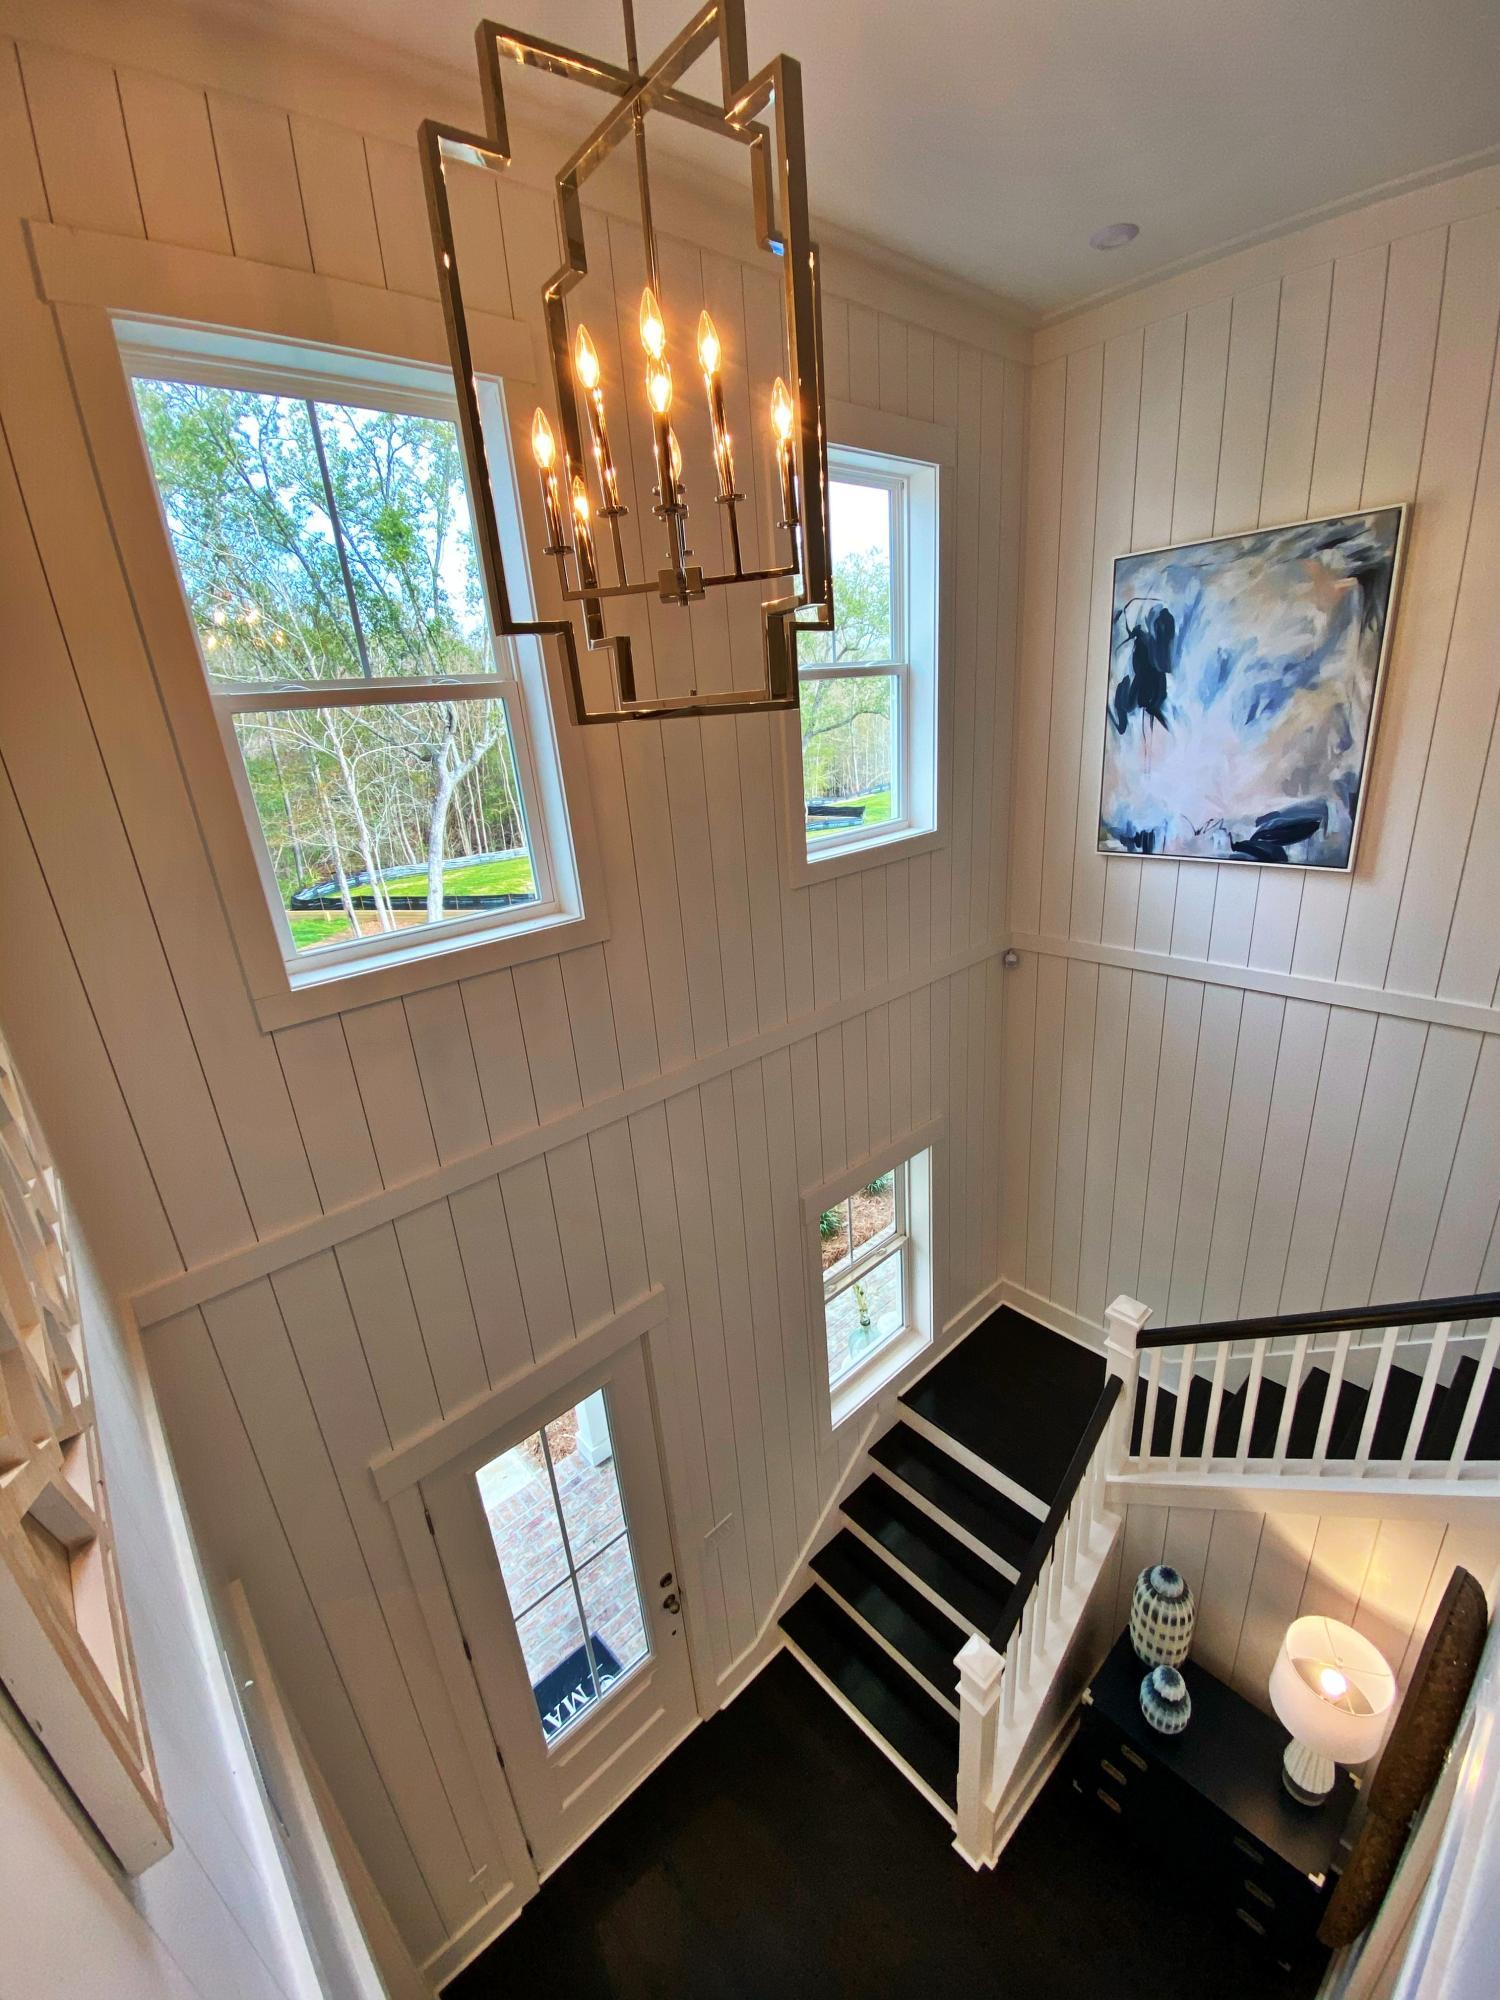 Fulton Park Homes For Sale - 1201 Max, Mount Pleasant, SC - 0